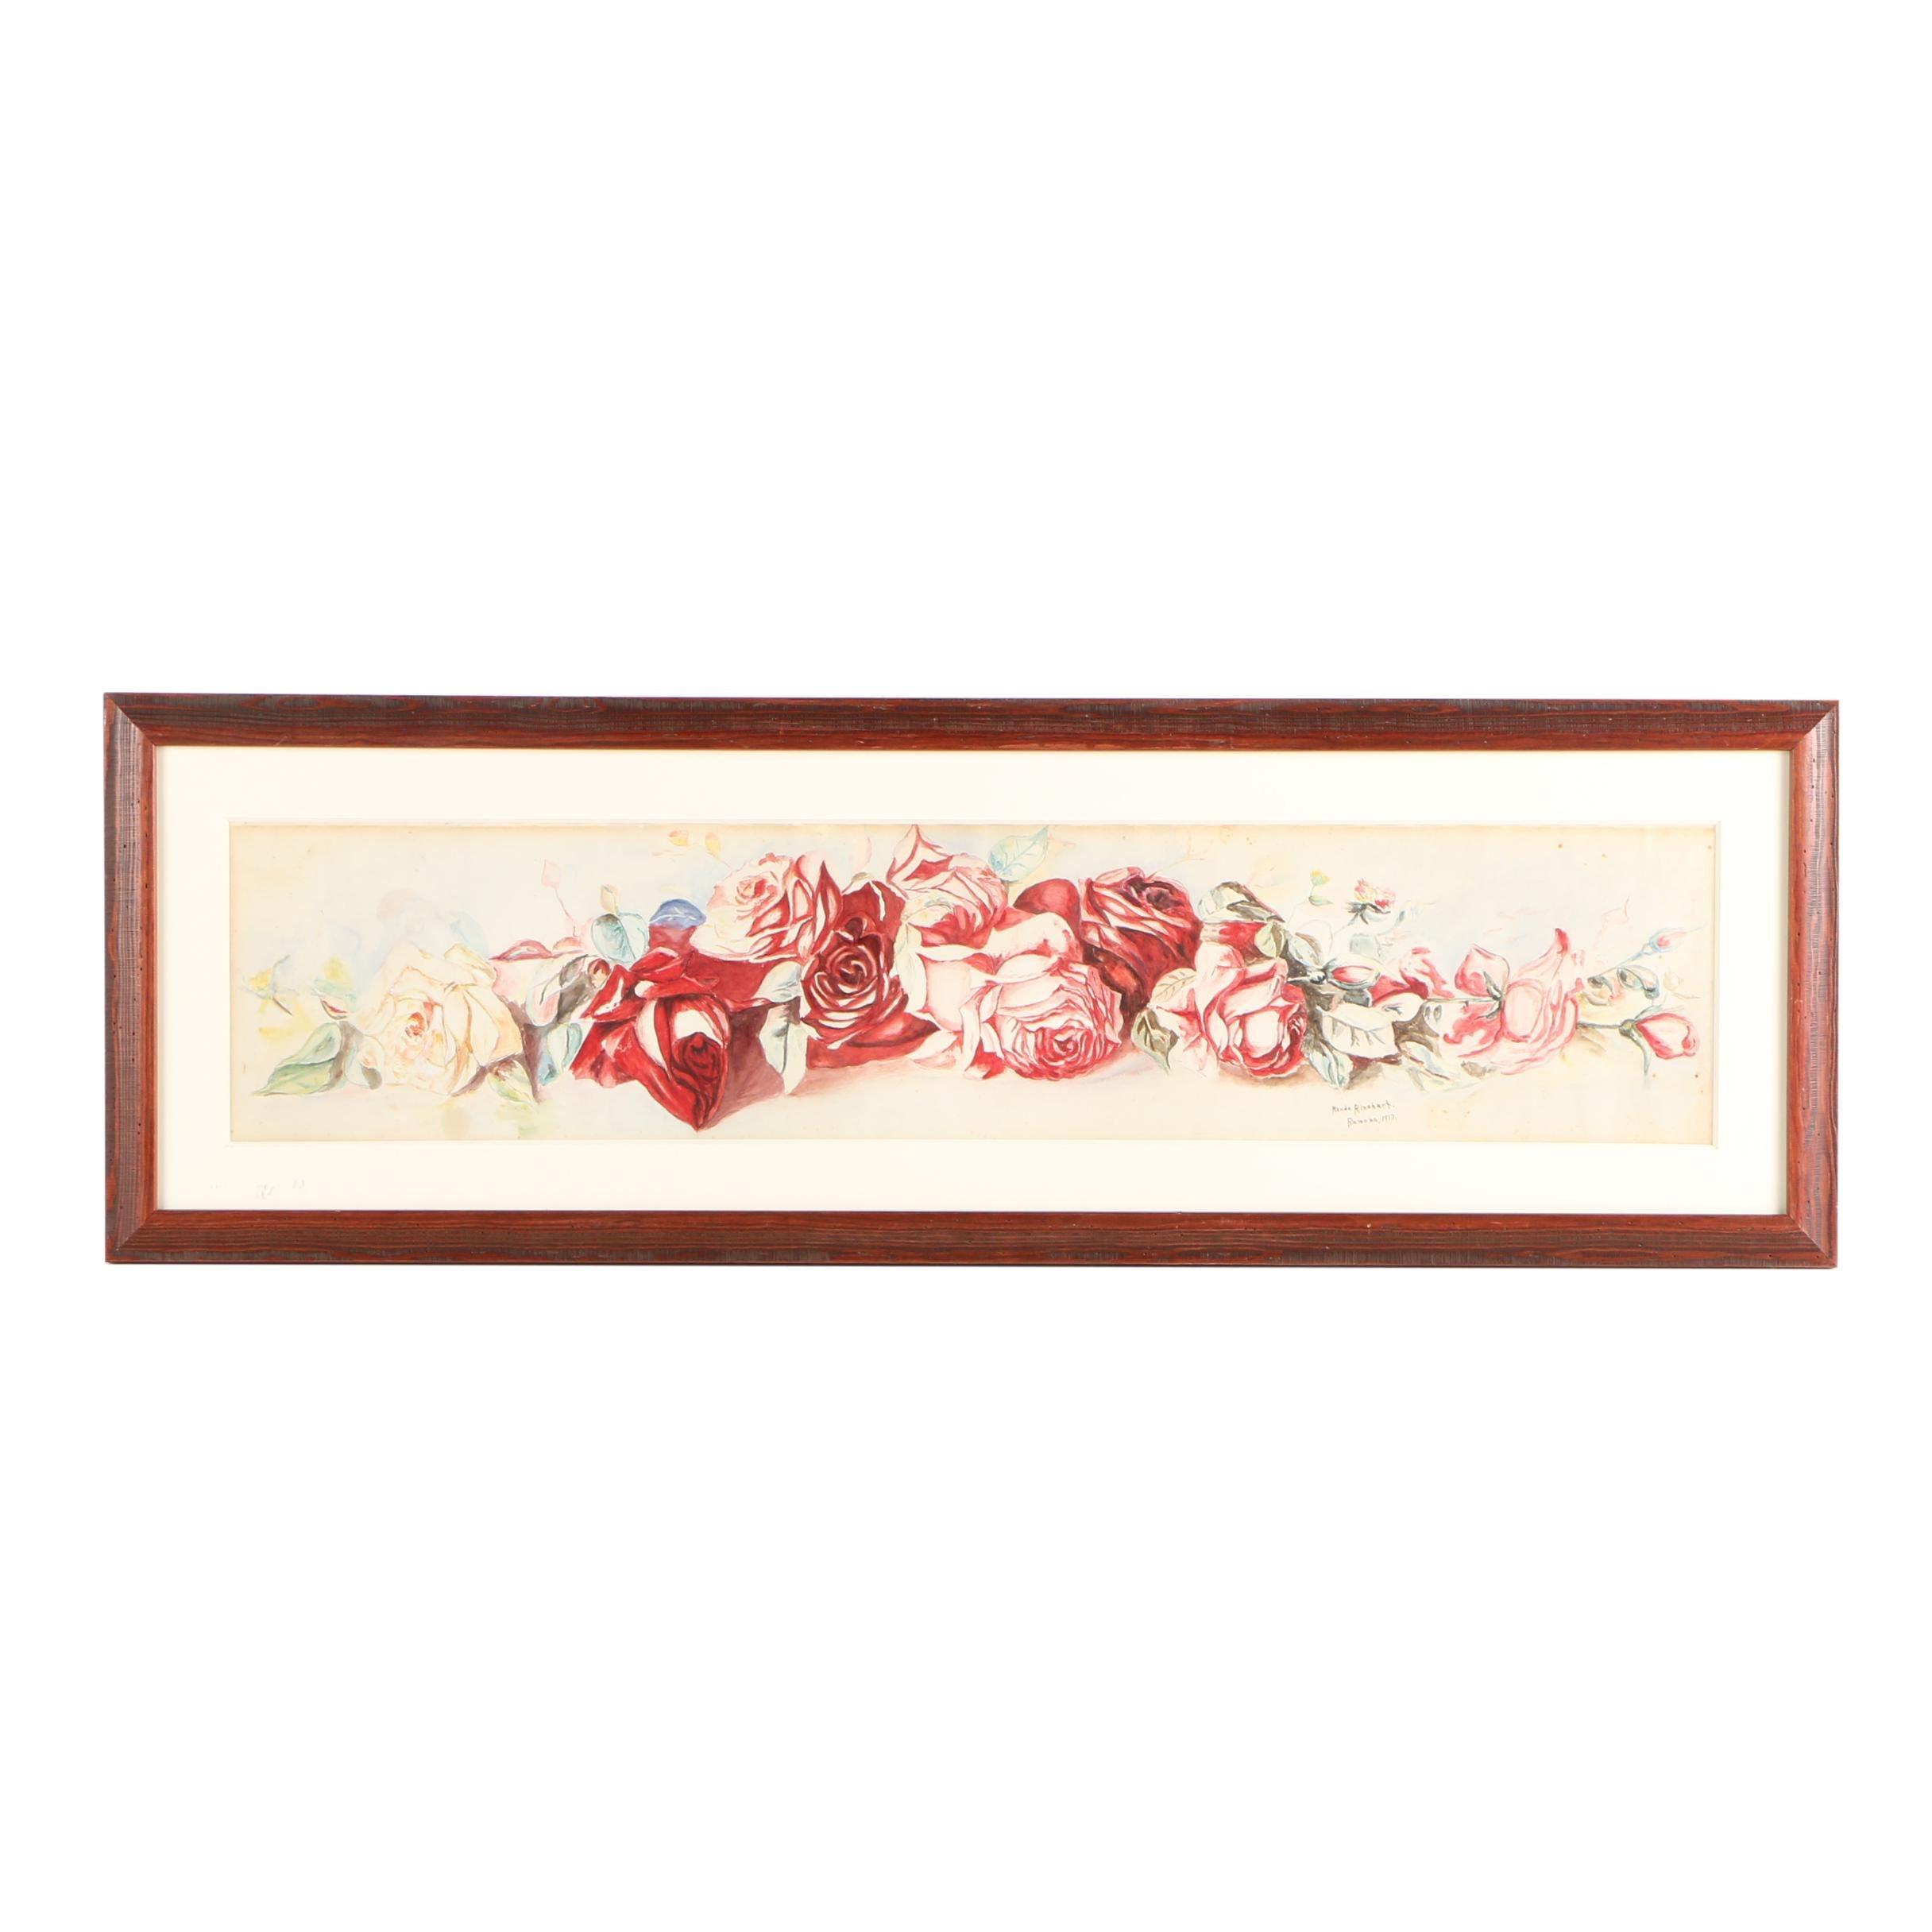 Maude Rinehart Watercolor Painting Of Roses Ebth